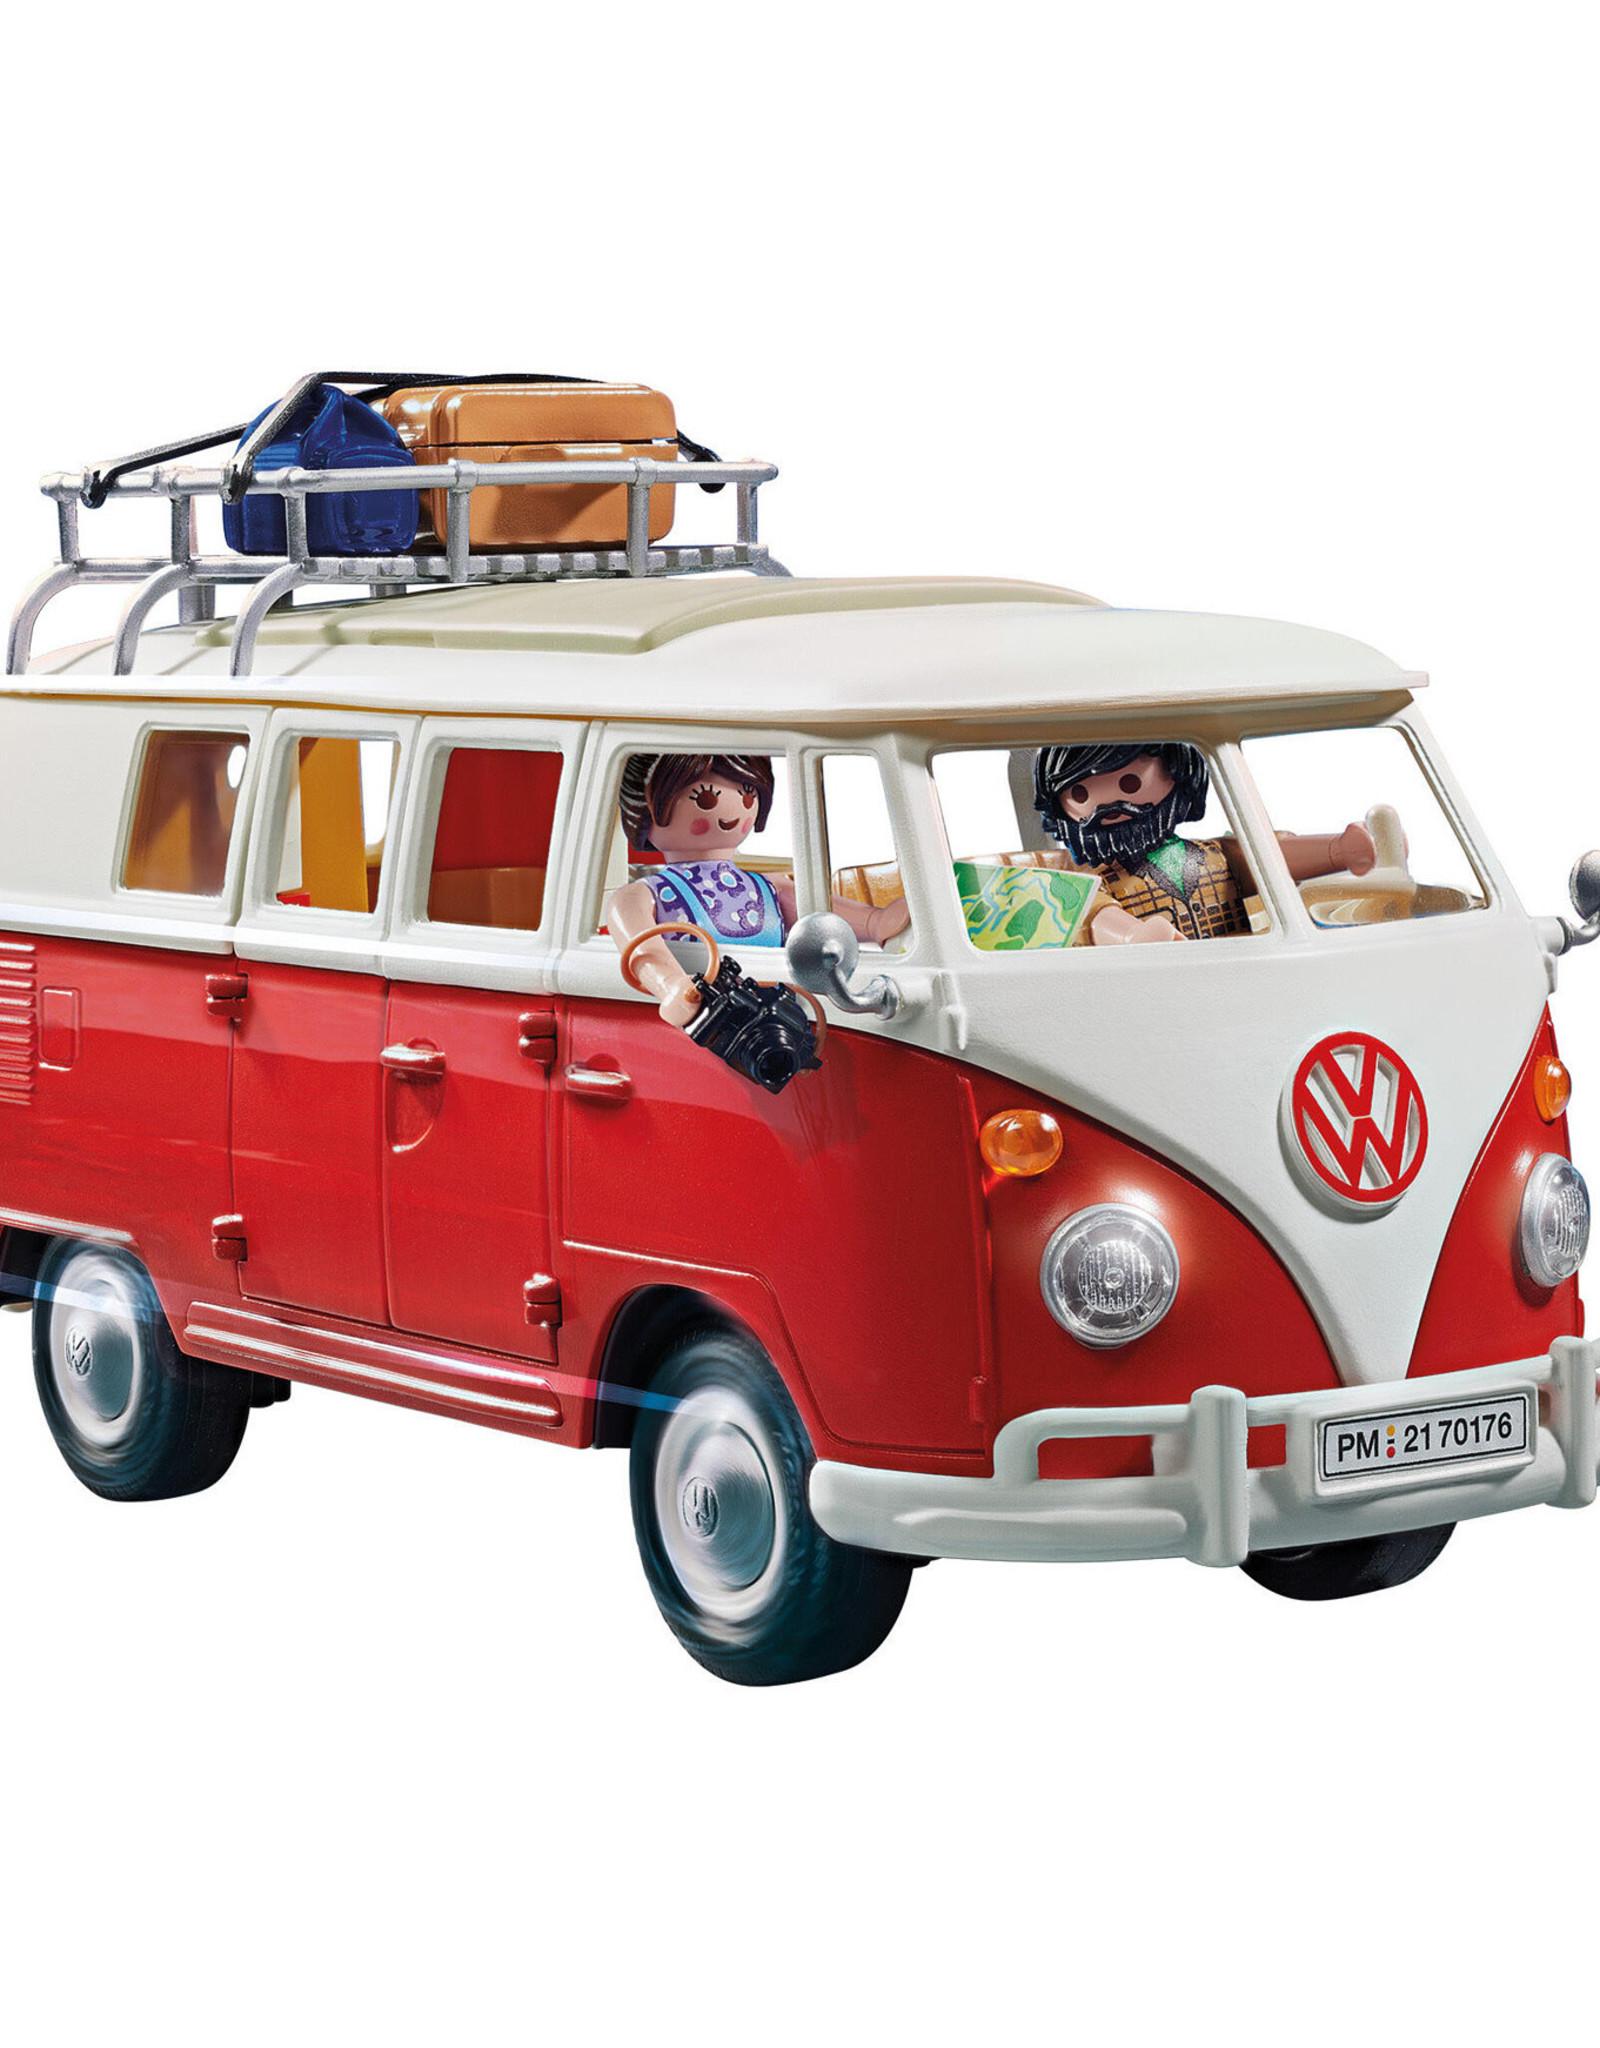 Playmobil Licenses Volkswagen T1 Camping Bus